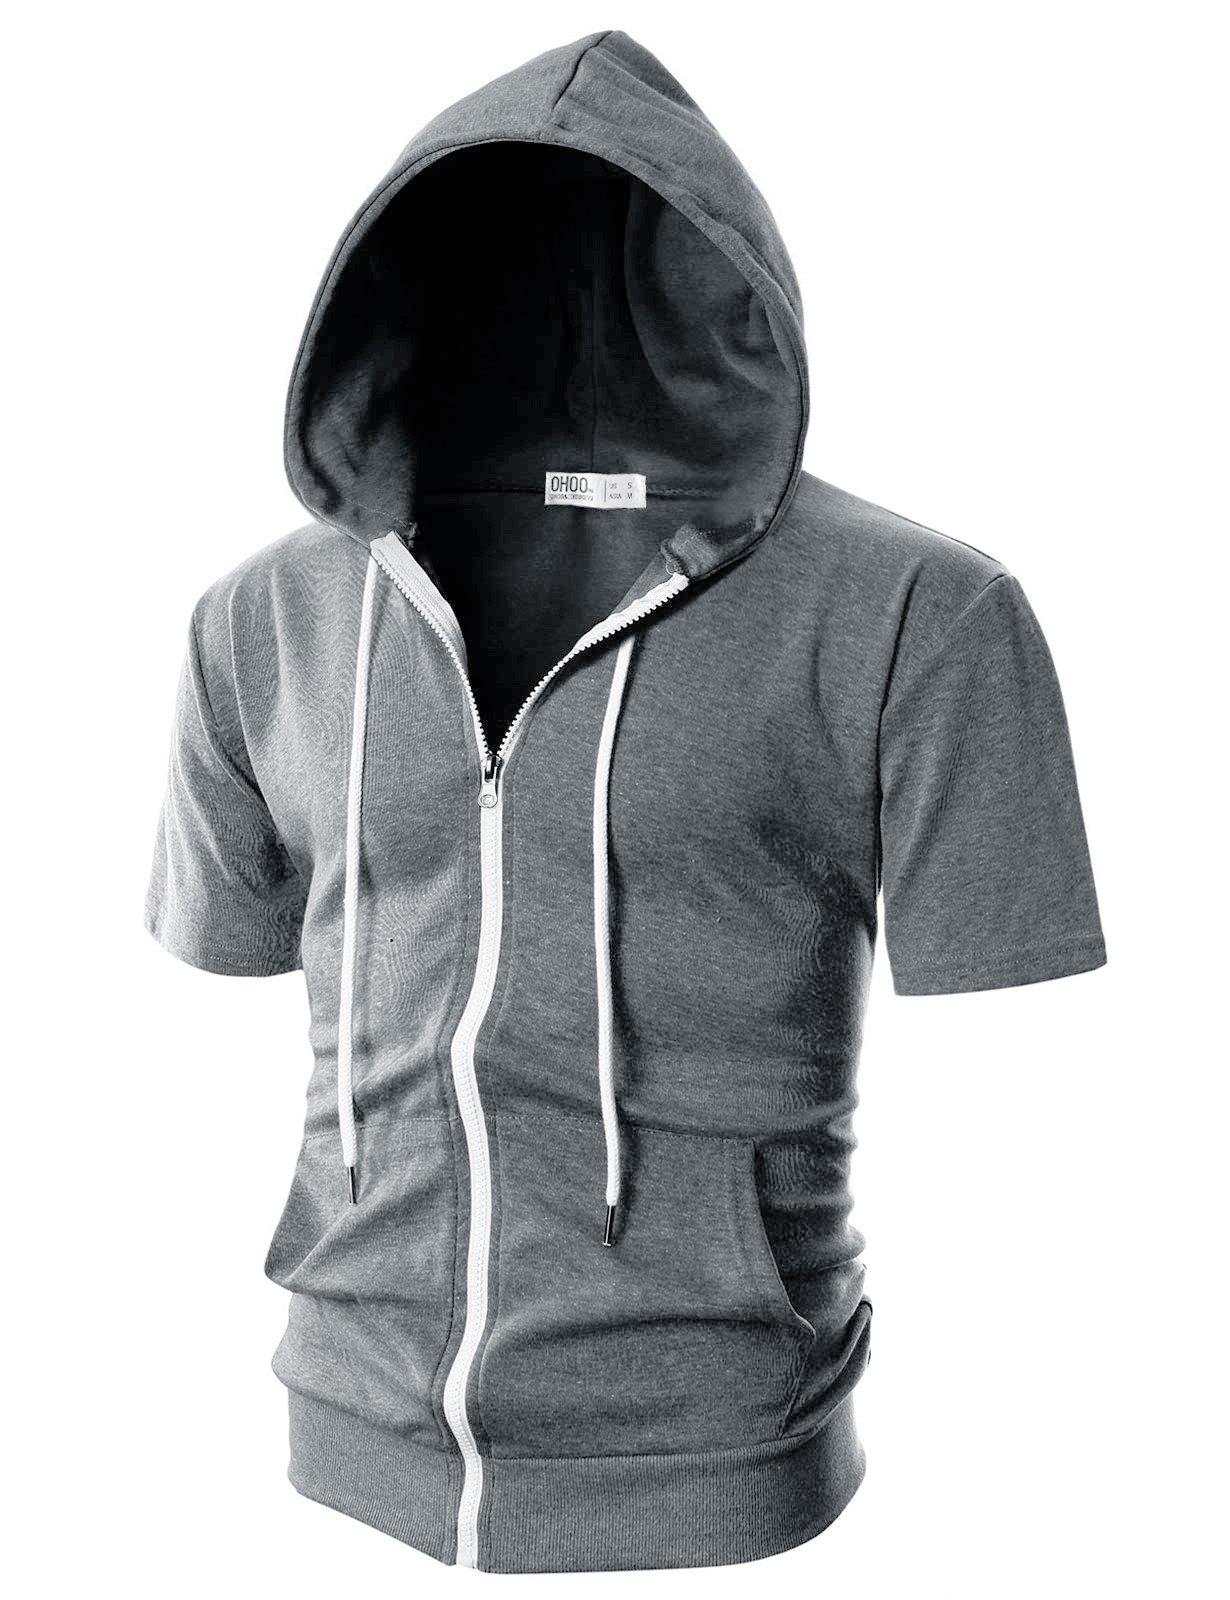 Ohoo Mens Slim Fit Short Sleeve Lightweight Zip-up Hoodie with Kanga Pocket/DCF007-DEEPGREY-3XL